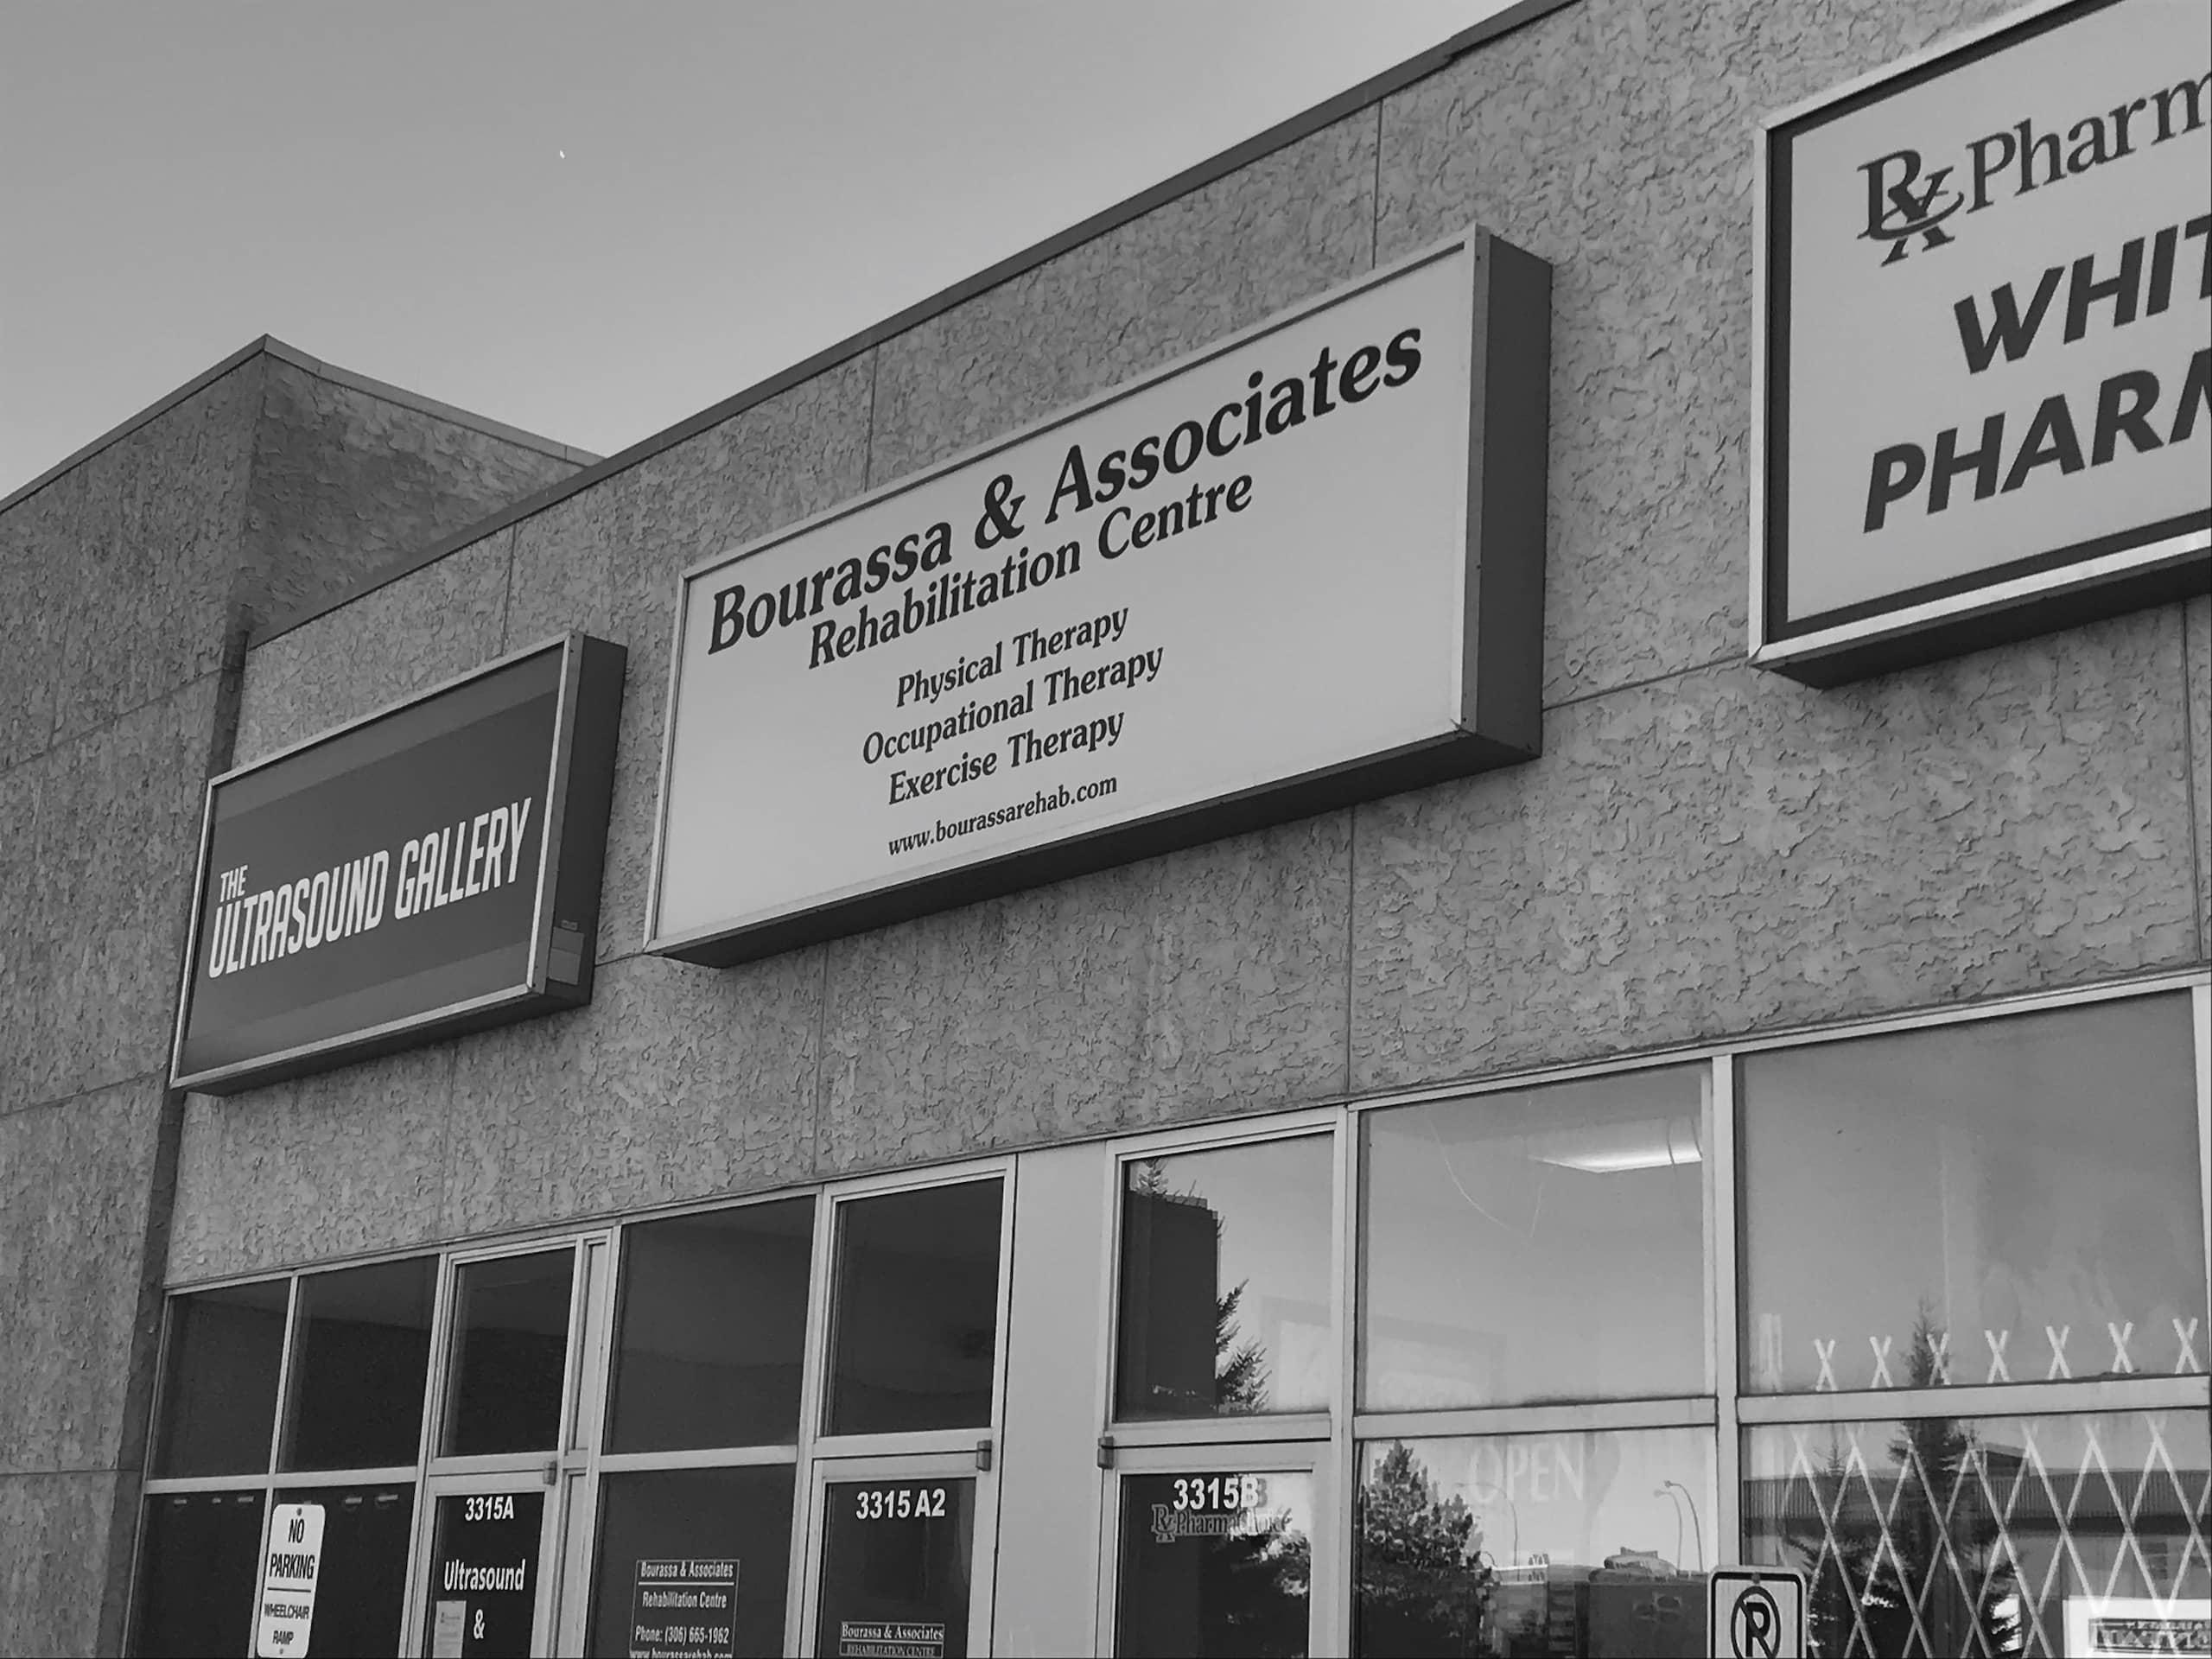 Saskatoon West | Bourassa & Associates Rehabilitation Centre